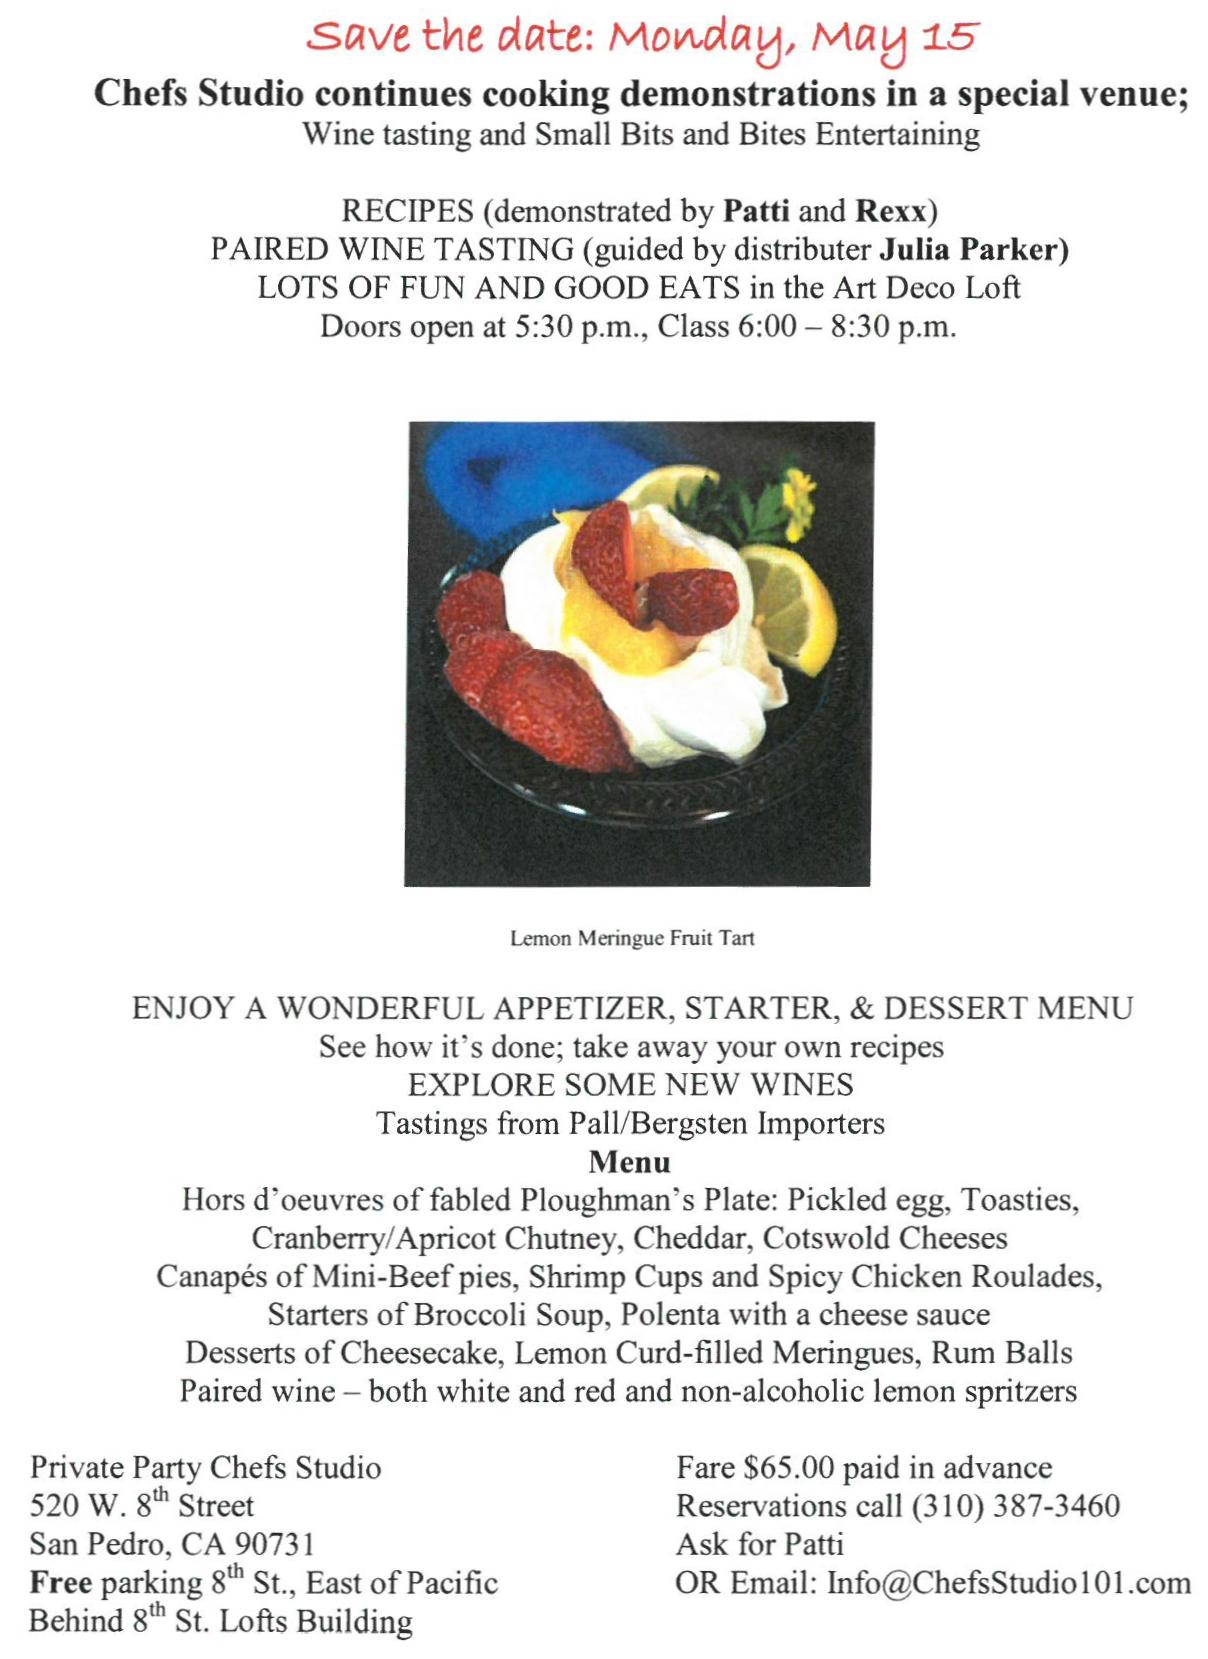 Chef's Studio May 15 flyer